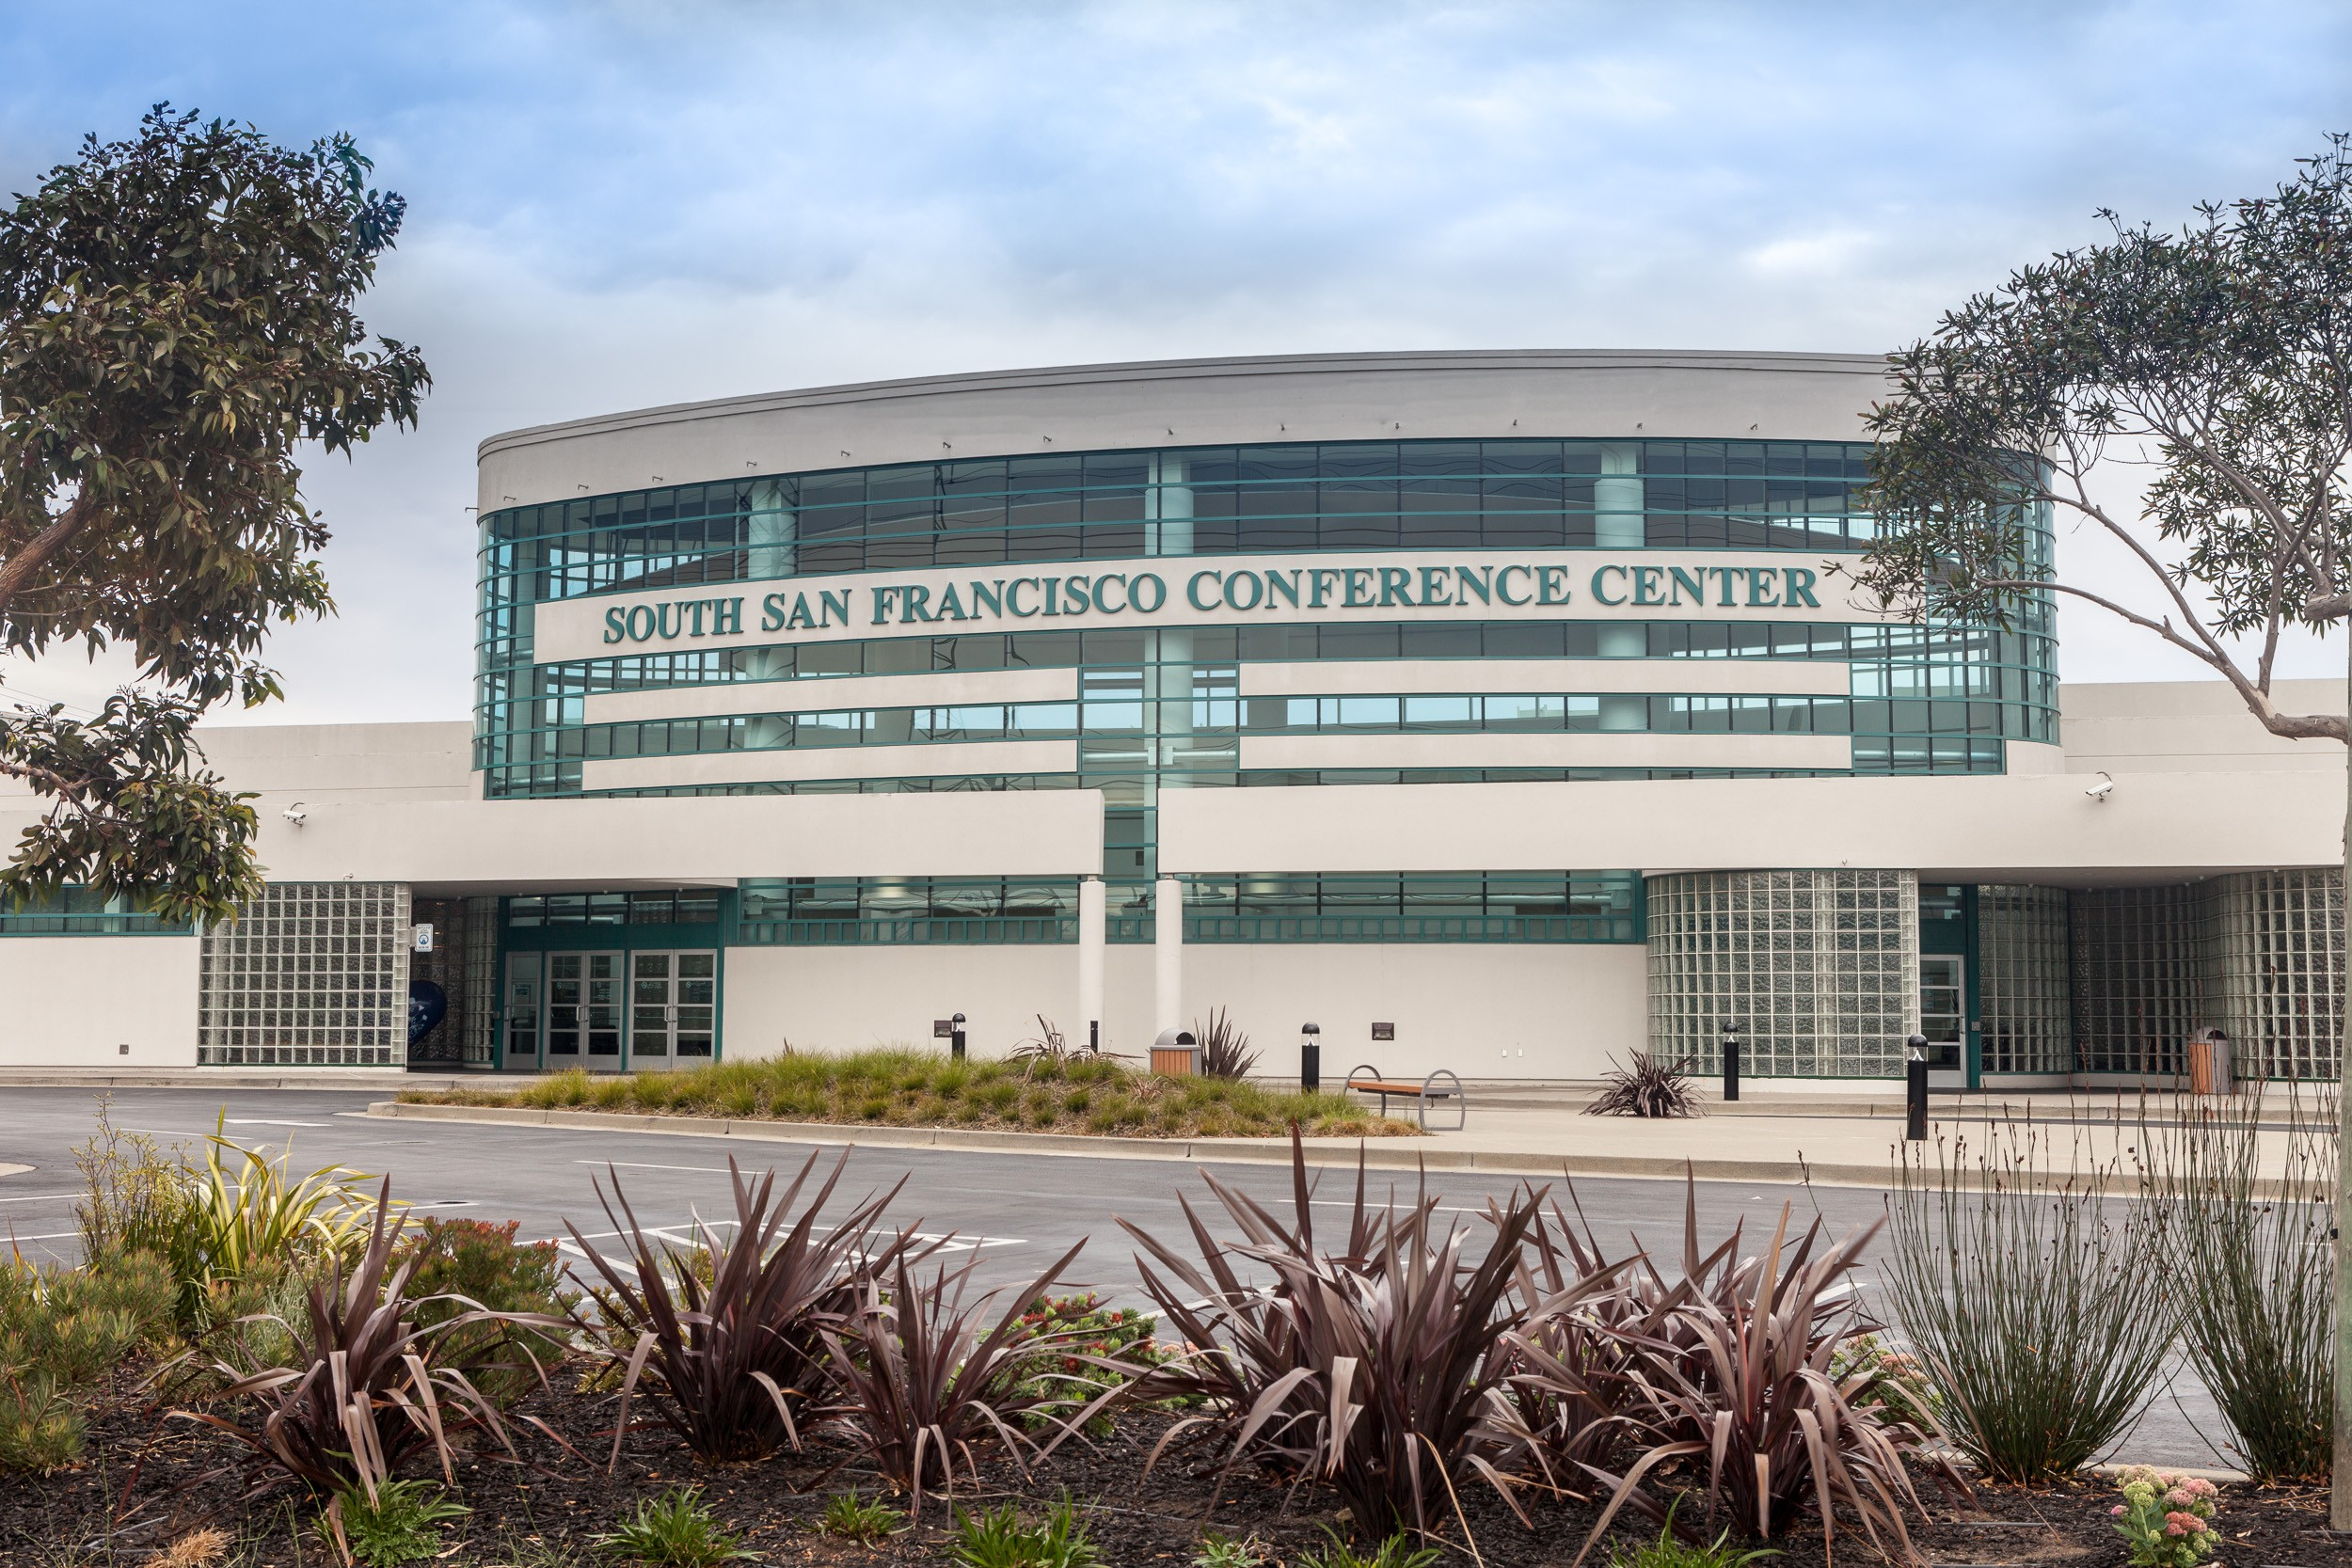 South San Francisco Conference Center | LinkedIn